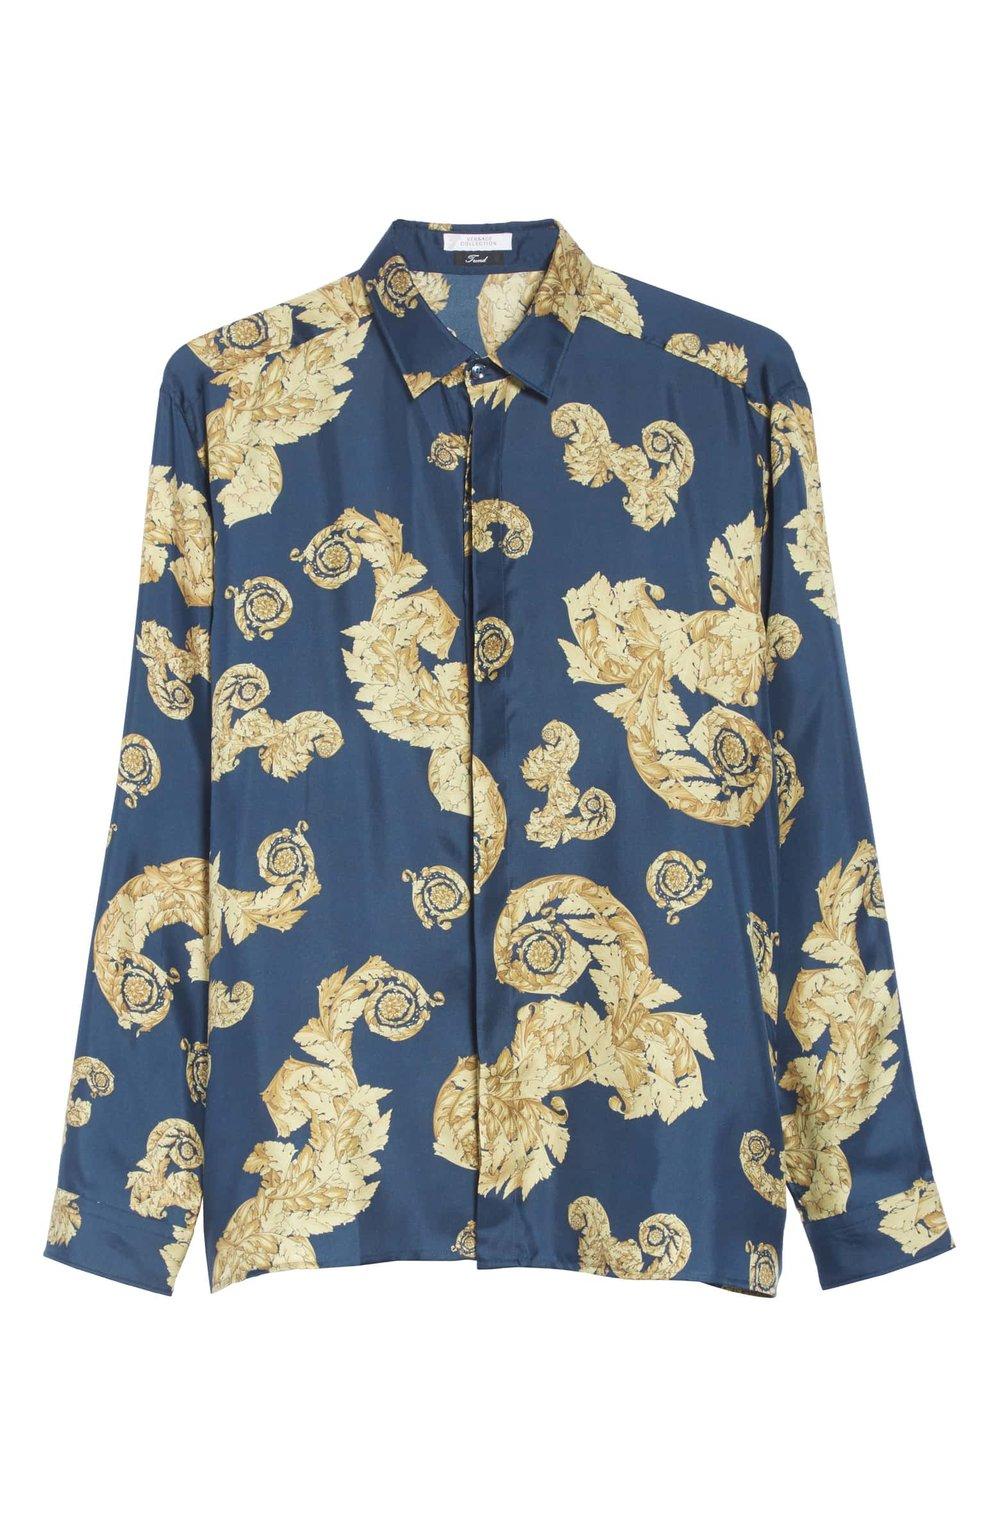 Versace Blue Gold Leaf Shirt.jpeg